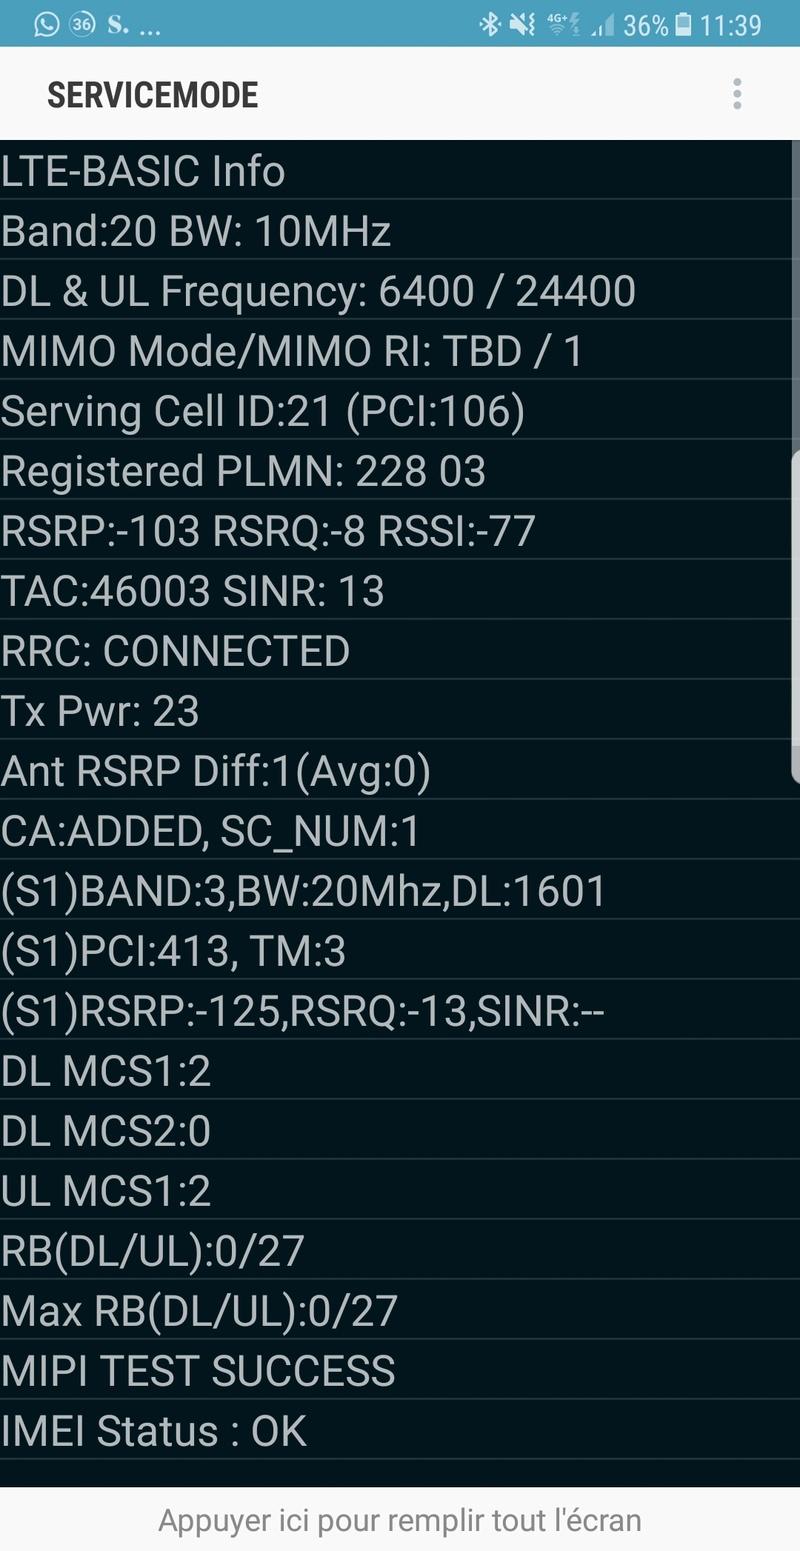 Quelle antenne 4g acheter  - Page 2 Tempfi10